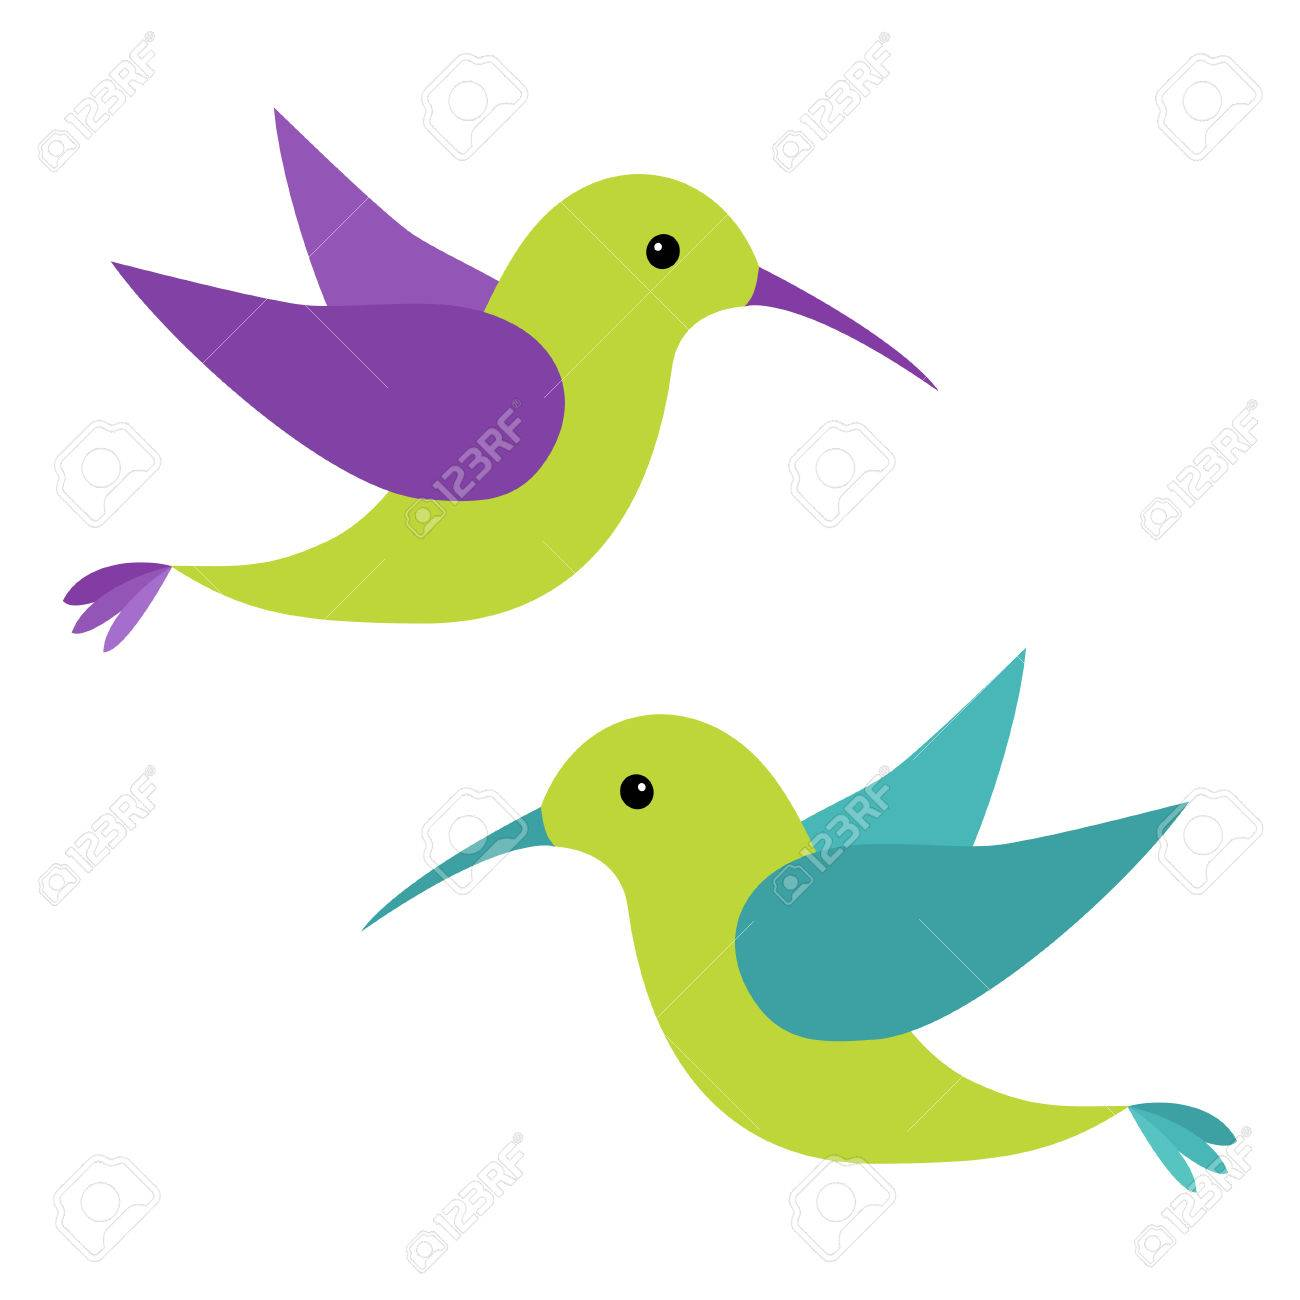 colibri flying bird icon